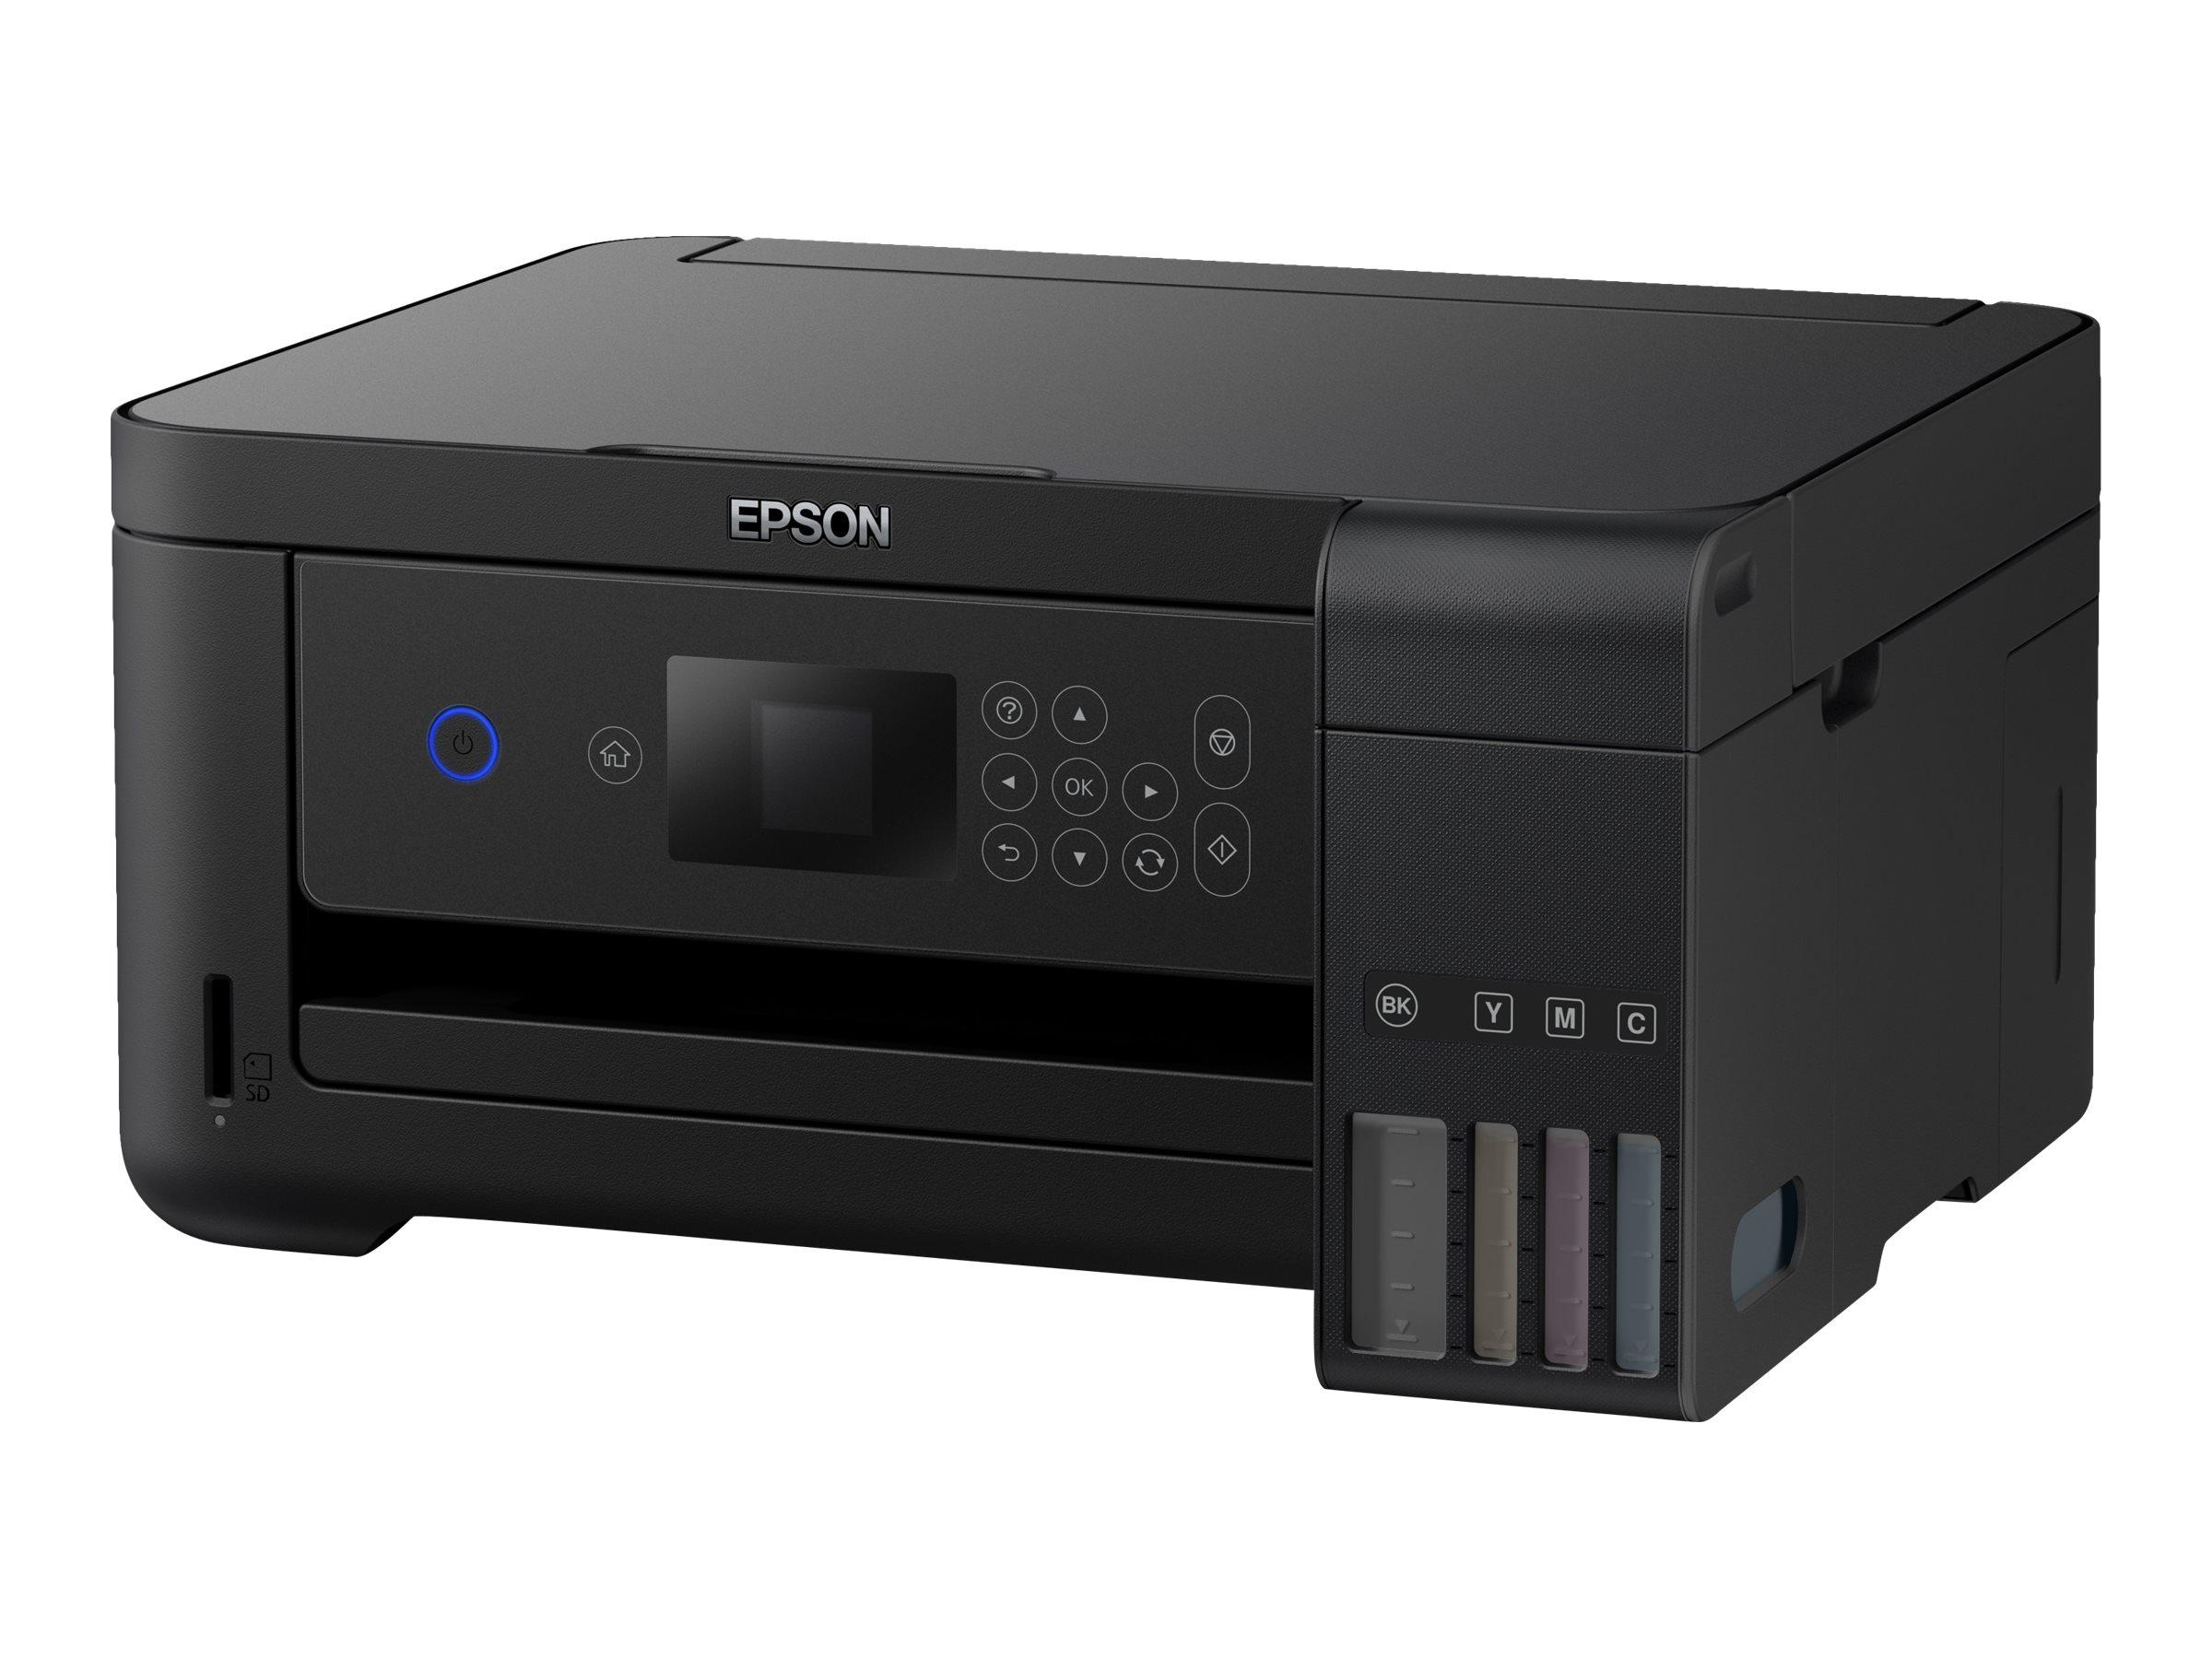 Epson EcoTank ET-2750 - Multifunktionsdrucker - Farbe - Tintenstrahl - A4/Legal (Medien)